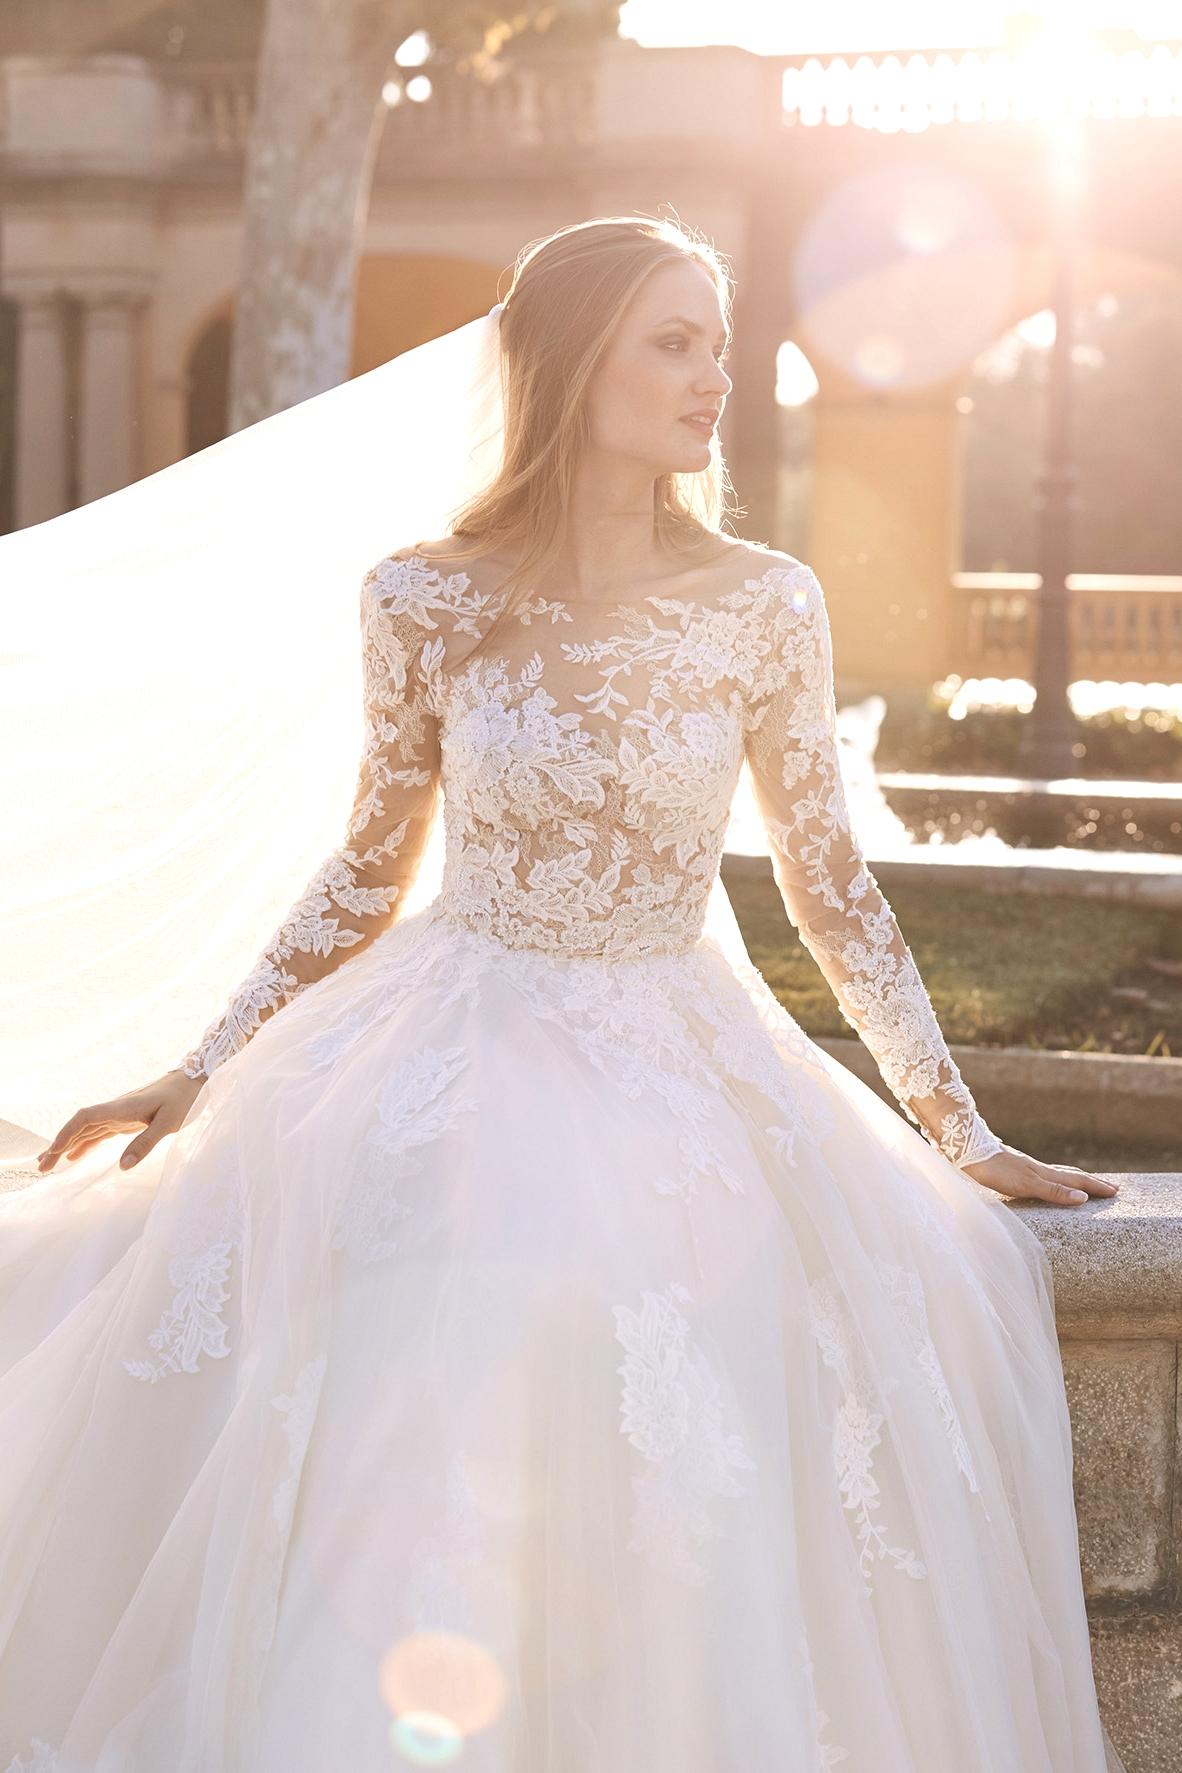 La Sposa PENELOPE Gown by St Patrick Bridal